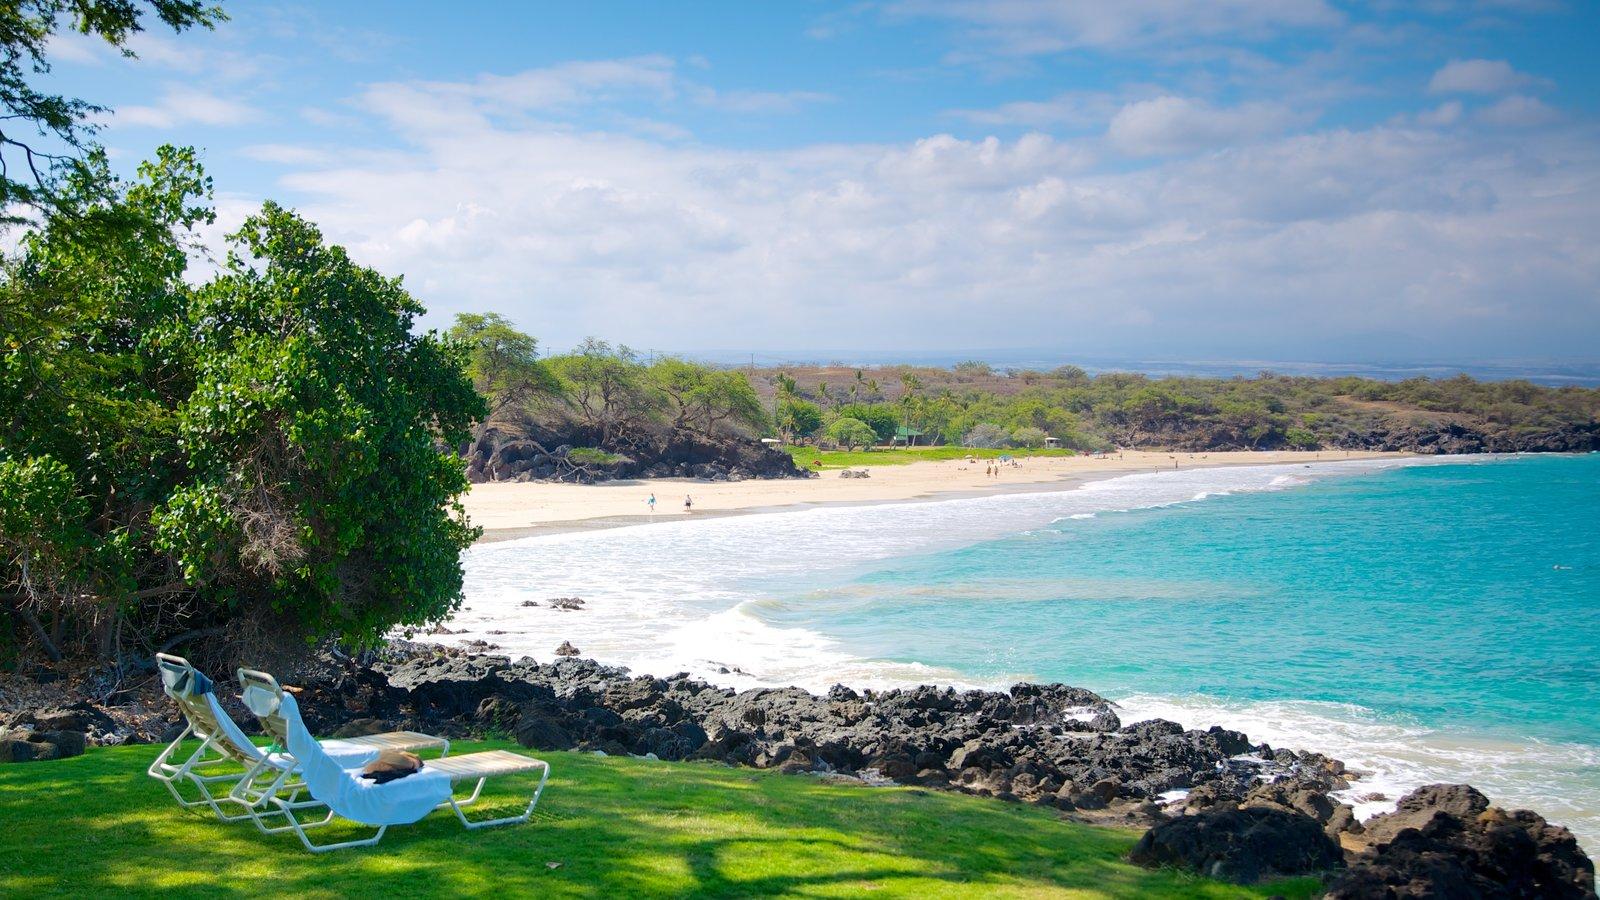 Hapuna Beach State Park Featuring A Park, Landscape Views And A Beach